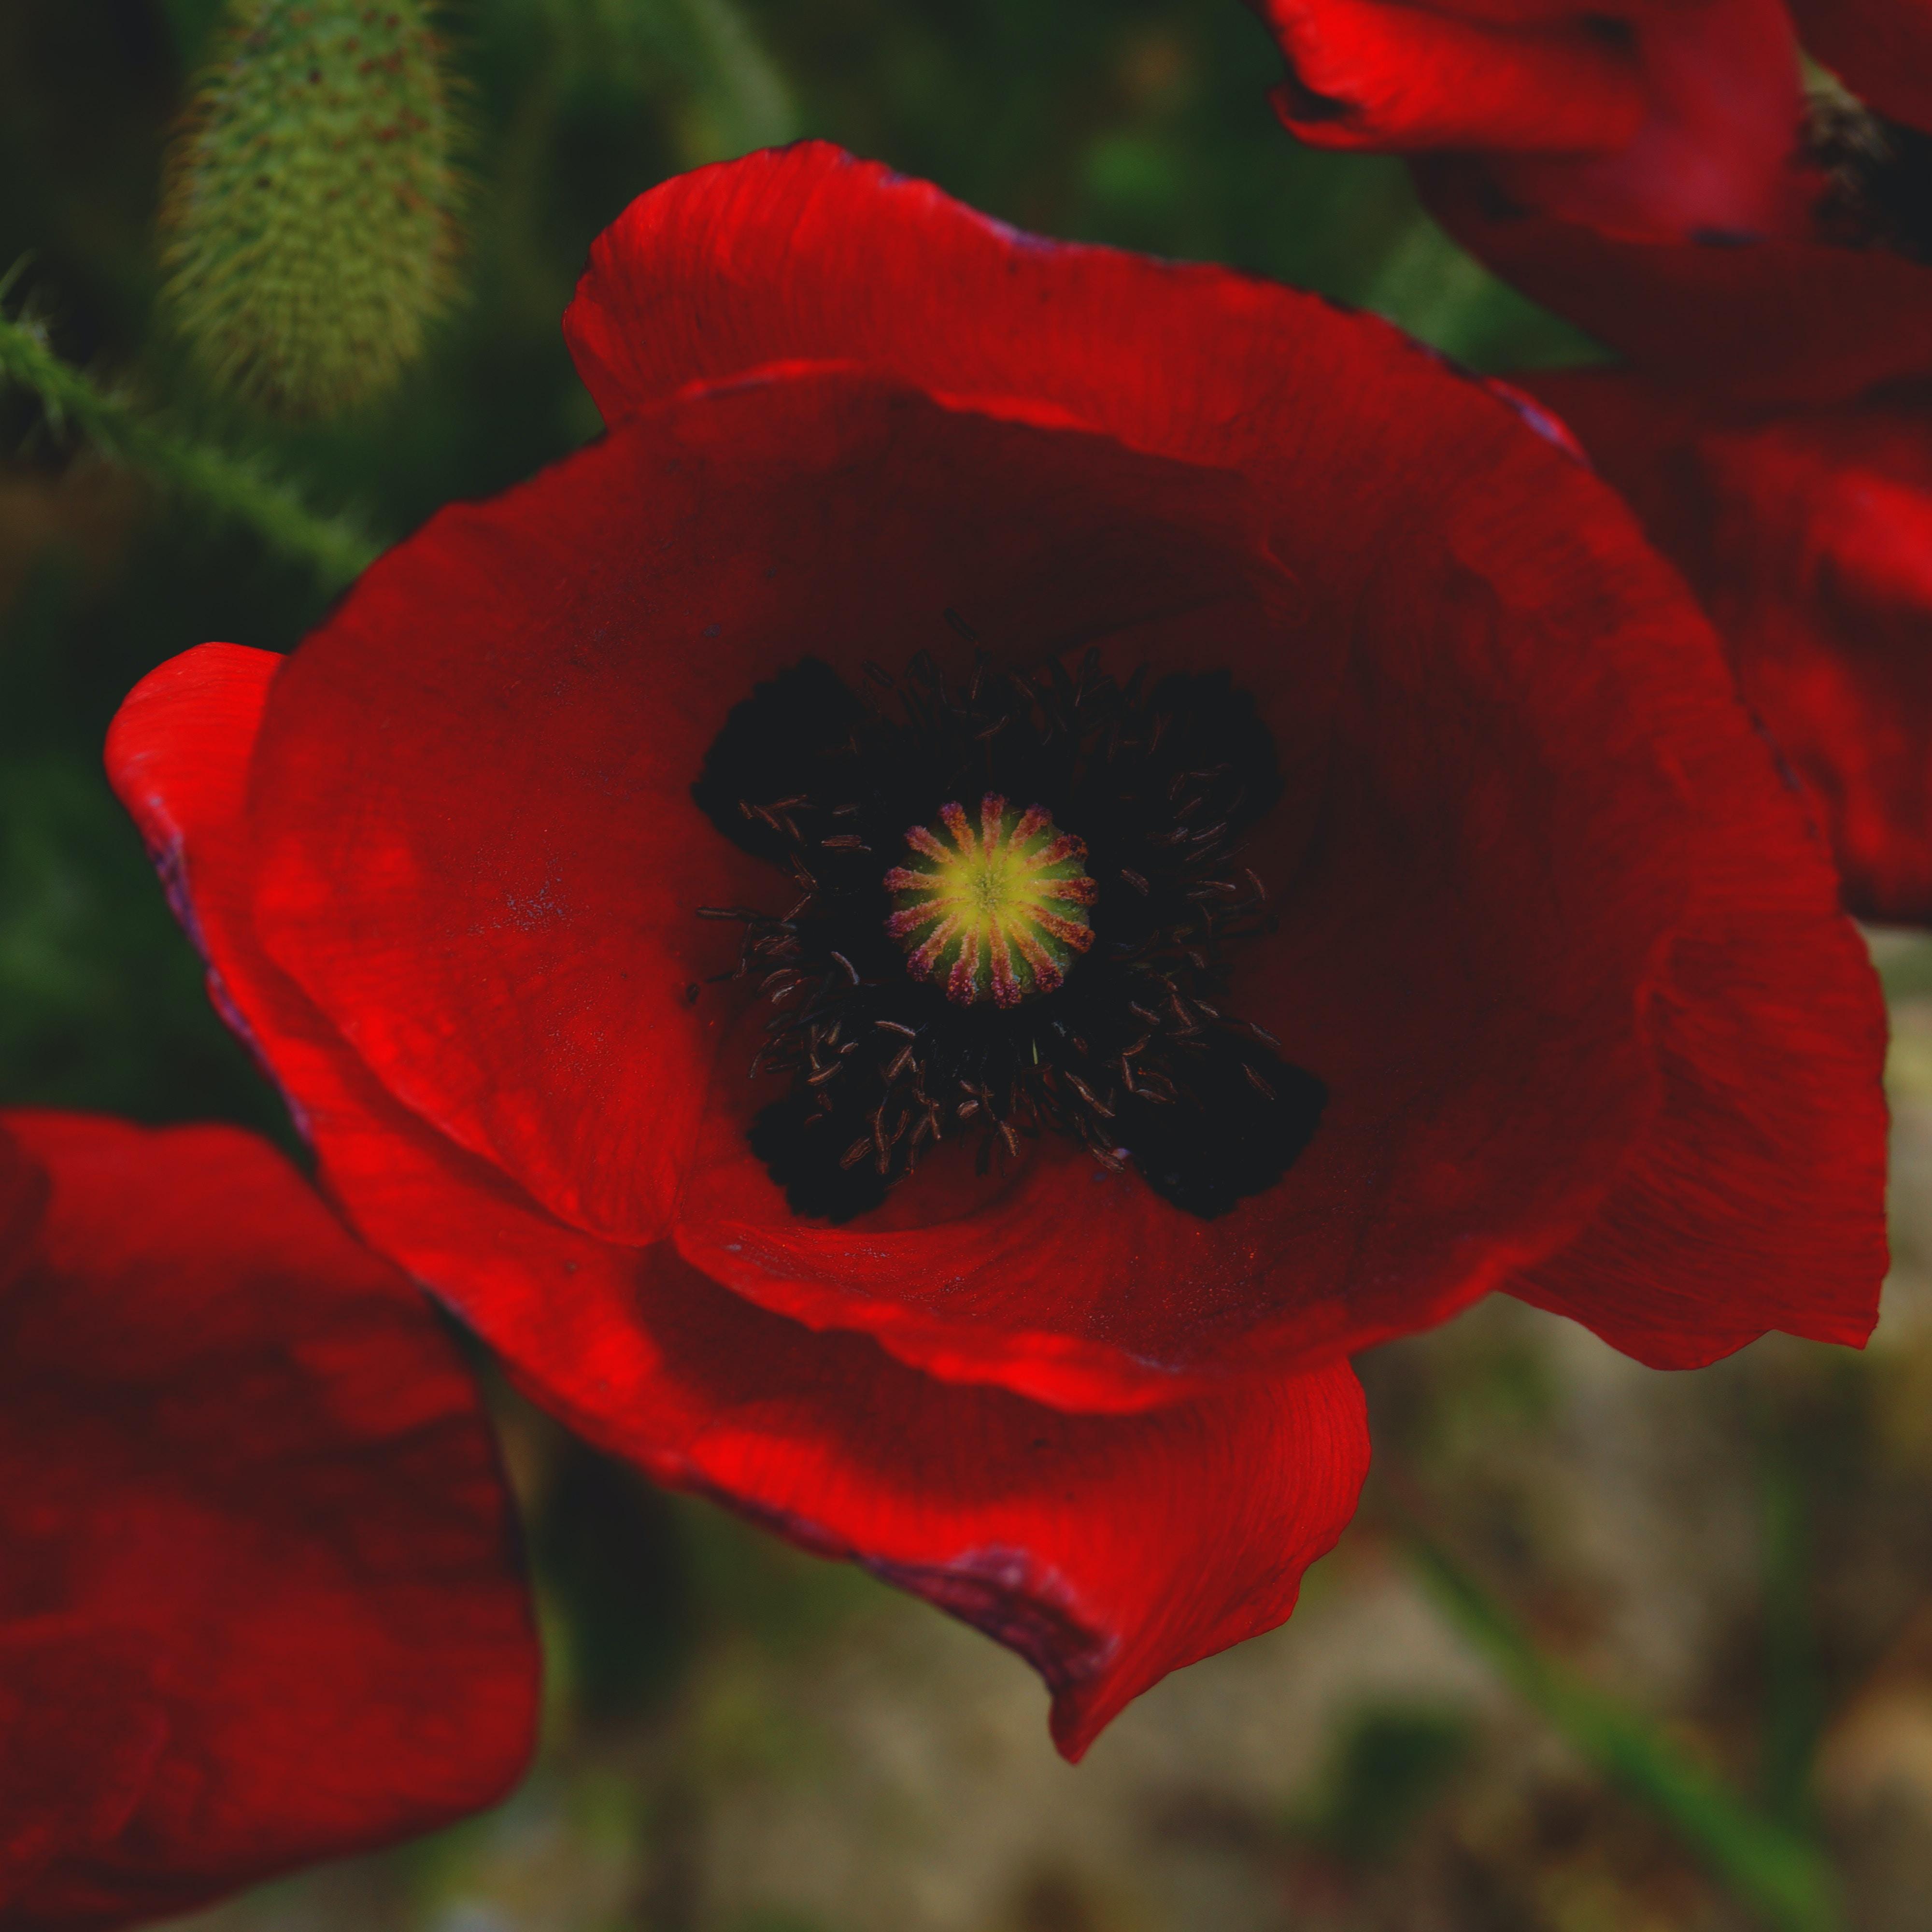 Macro of red poppy flower and green stem in bloom in Spring